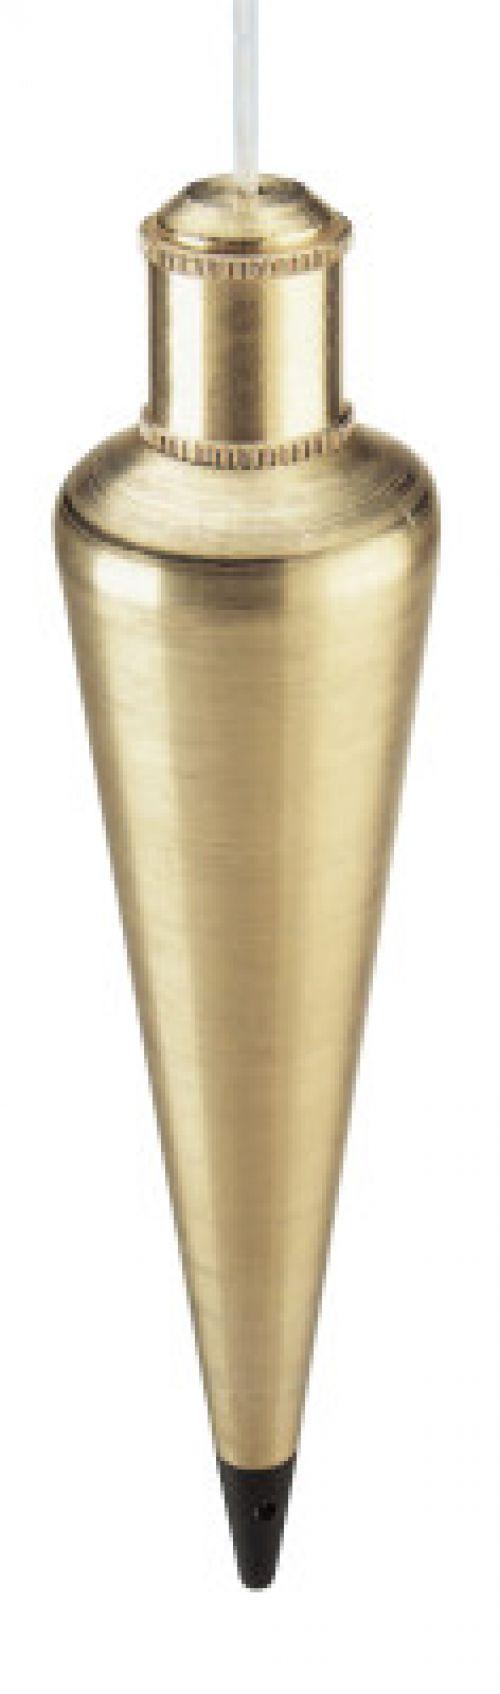 EMPIRE LEVEL Plumb Bobs, 12 oz, Corrosion Resistant Steel/Brass,